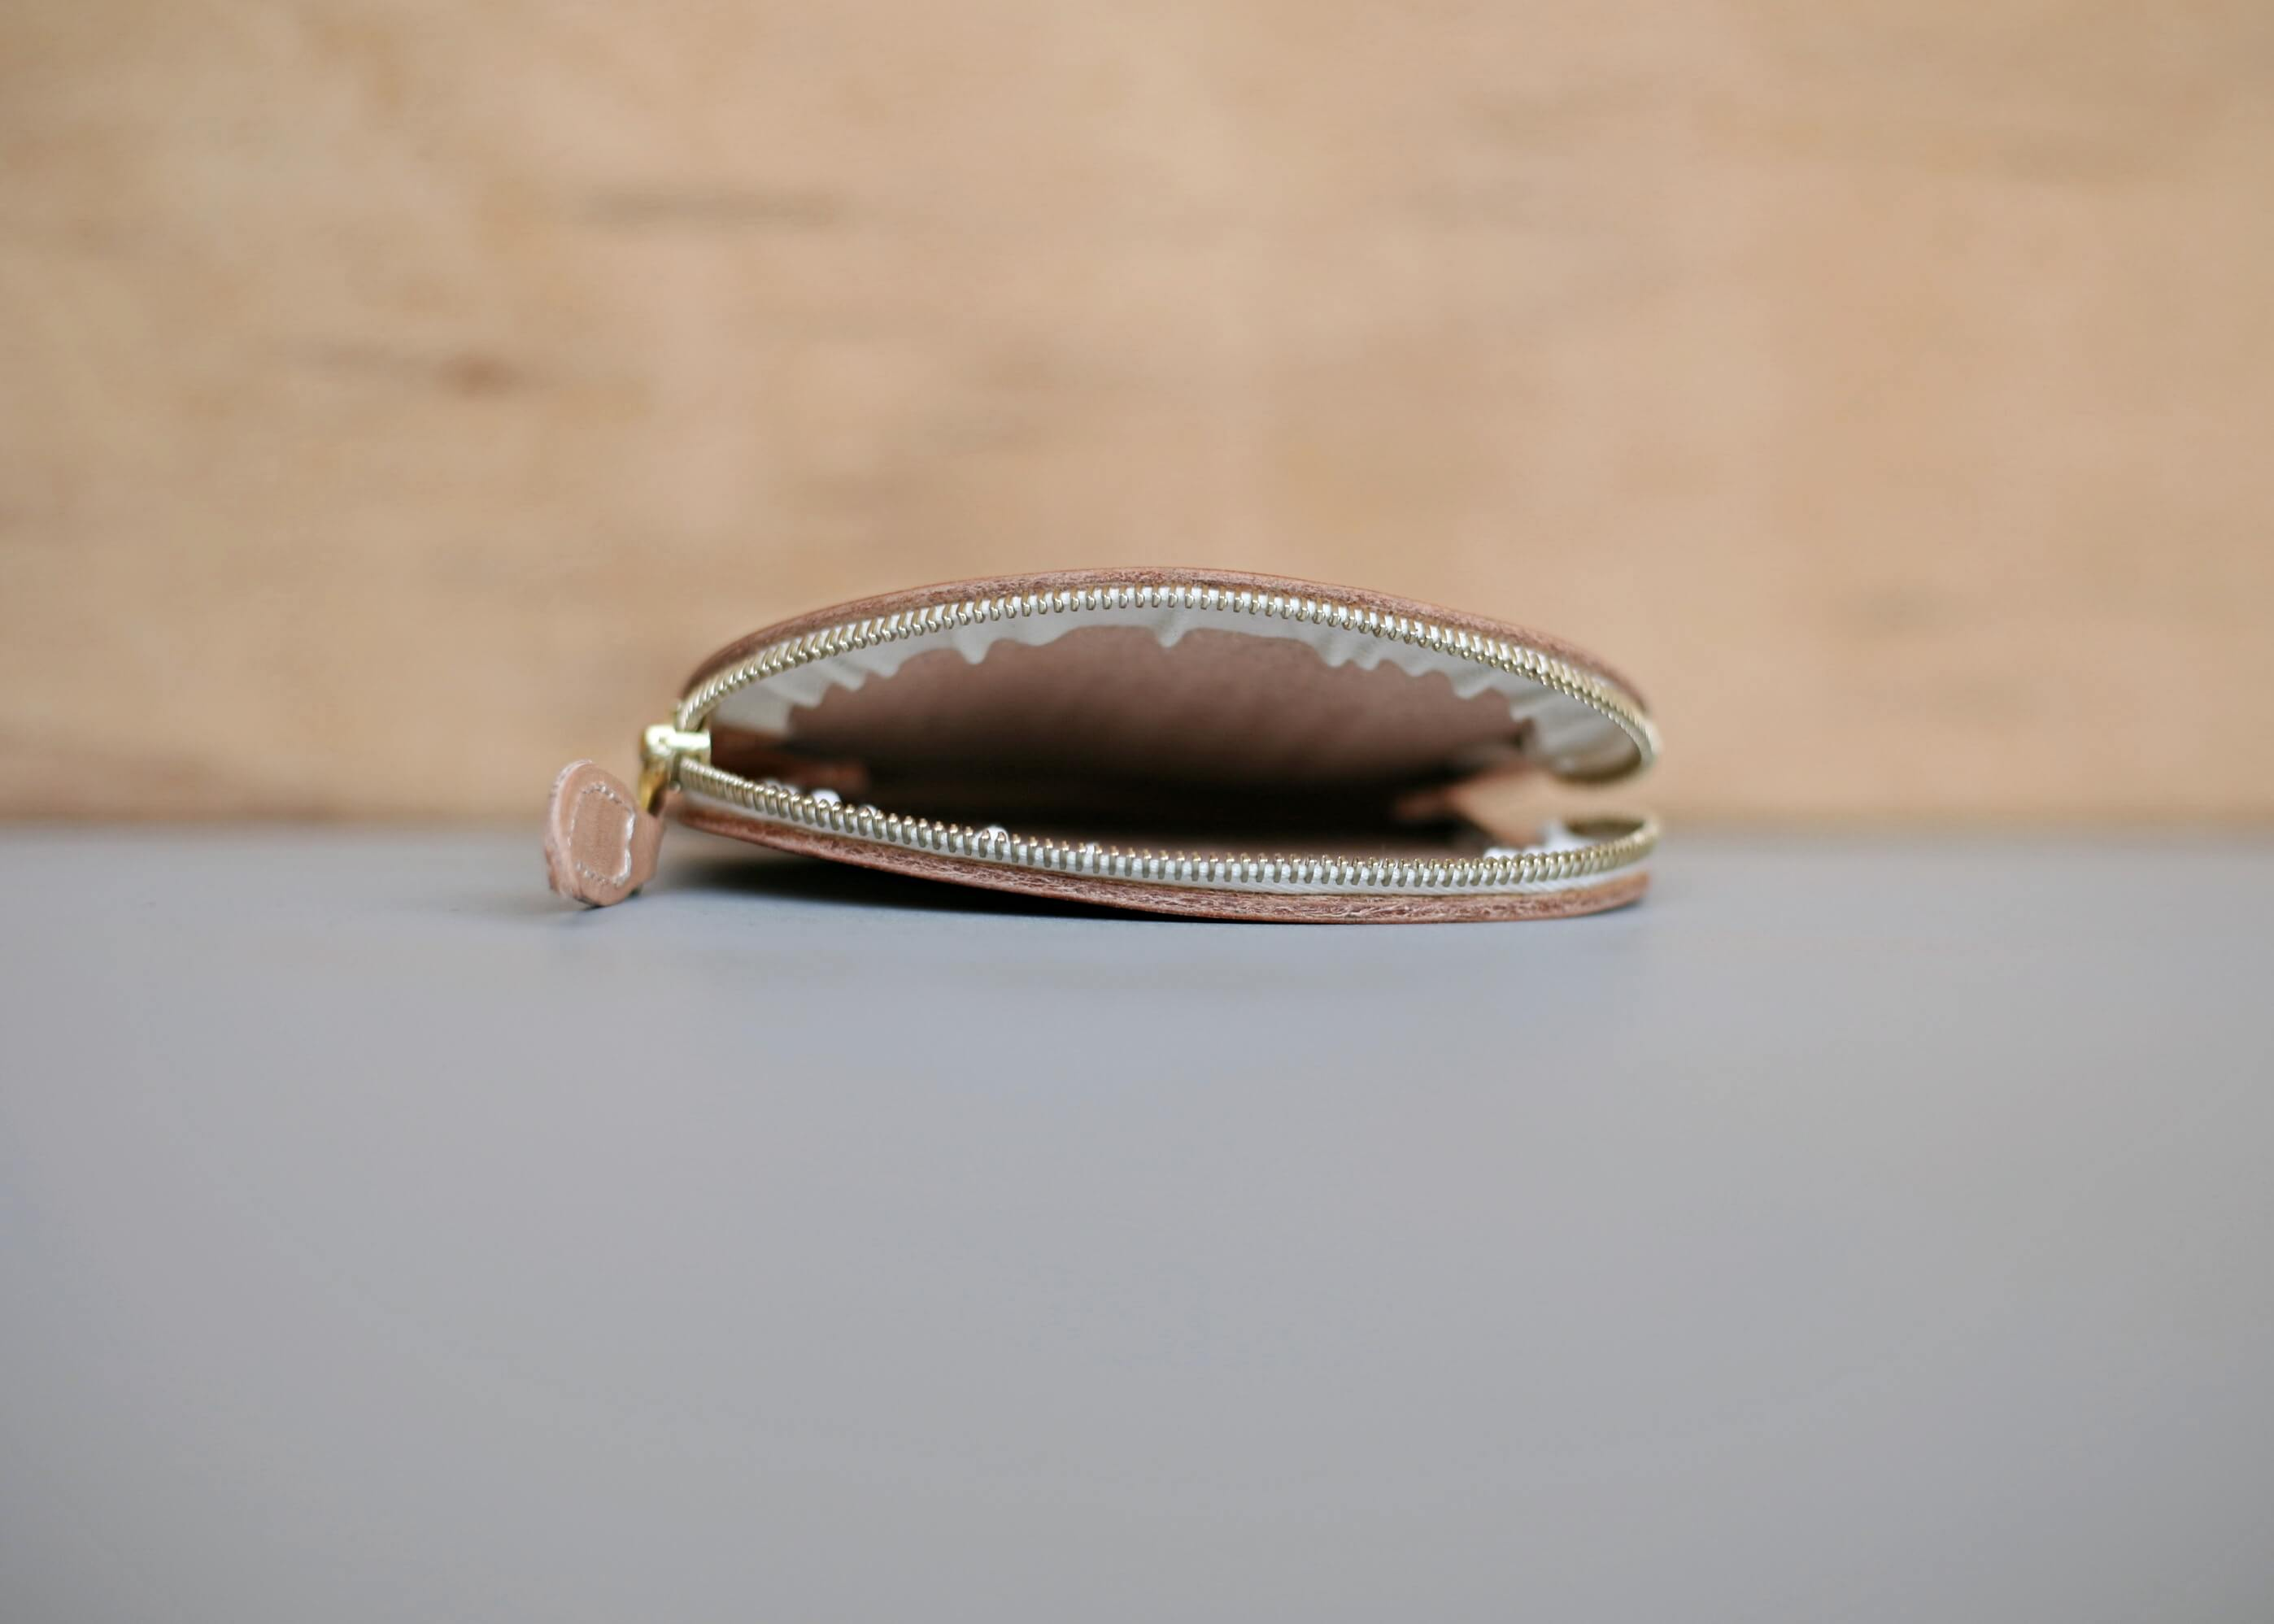 20/80 tochigi leather apple coin purse 横からの写真